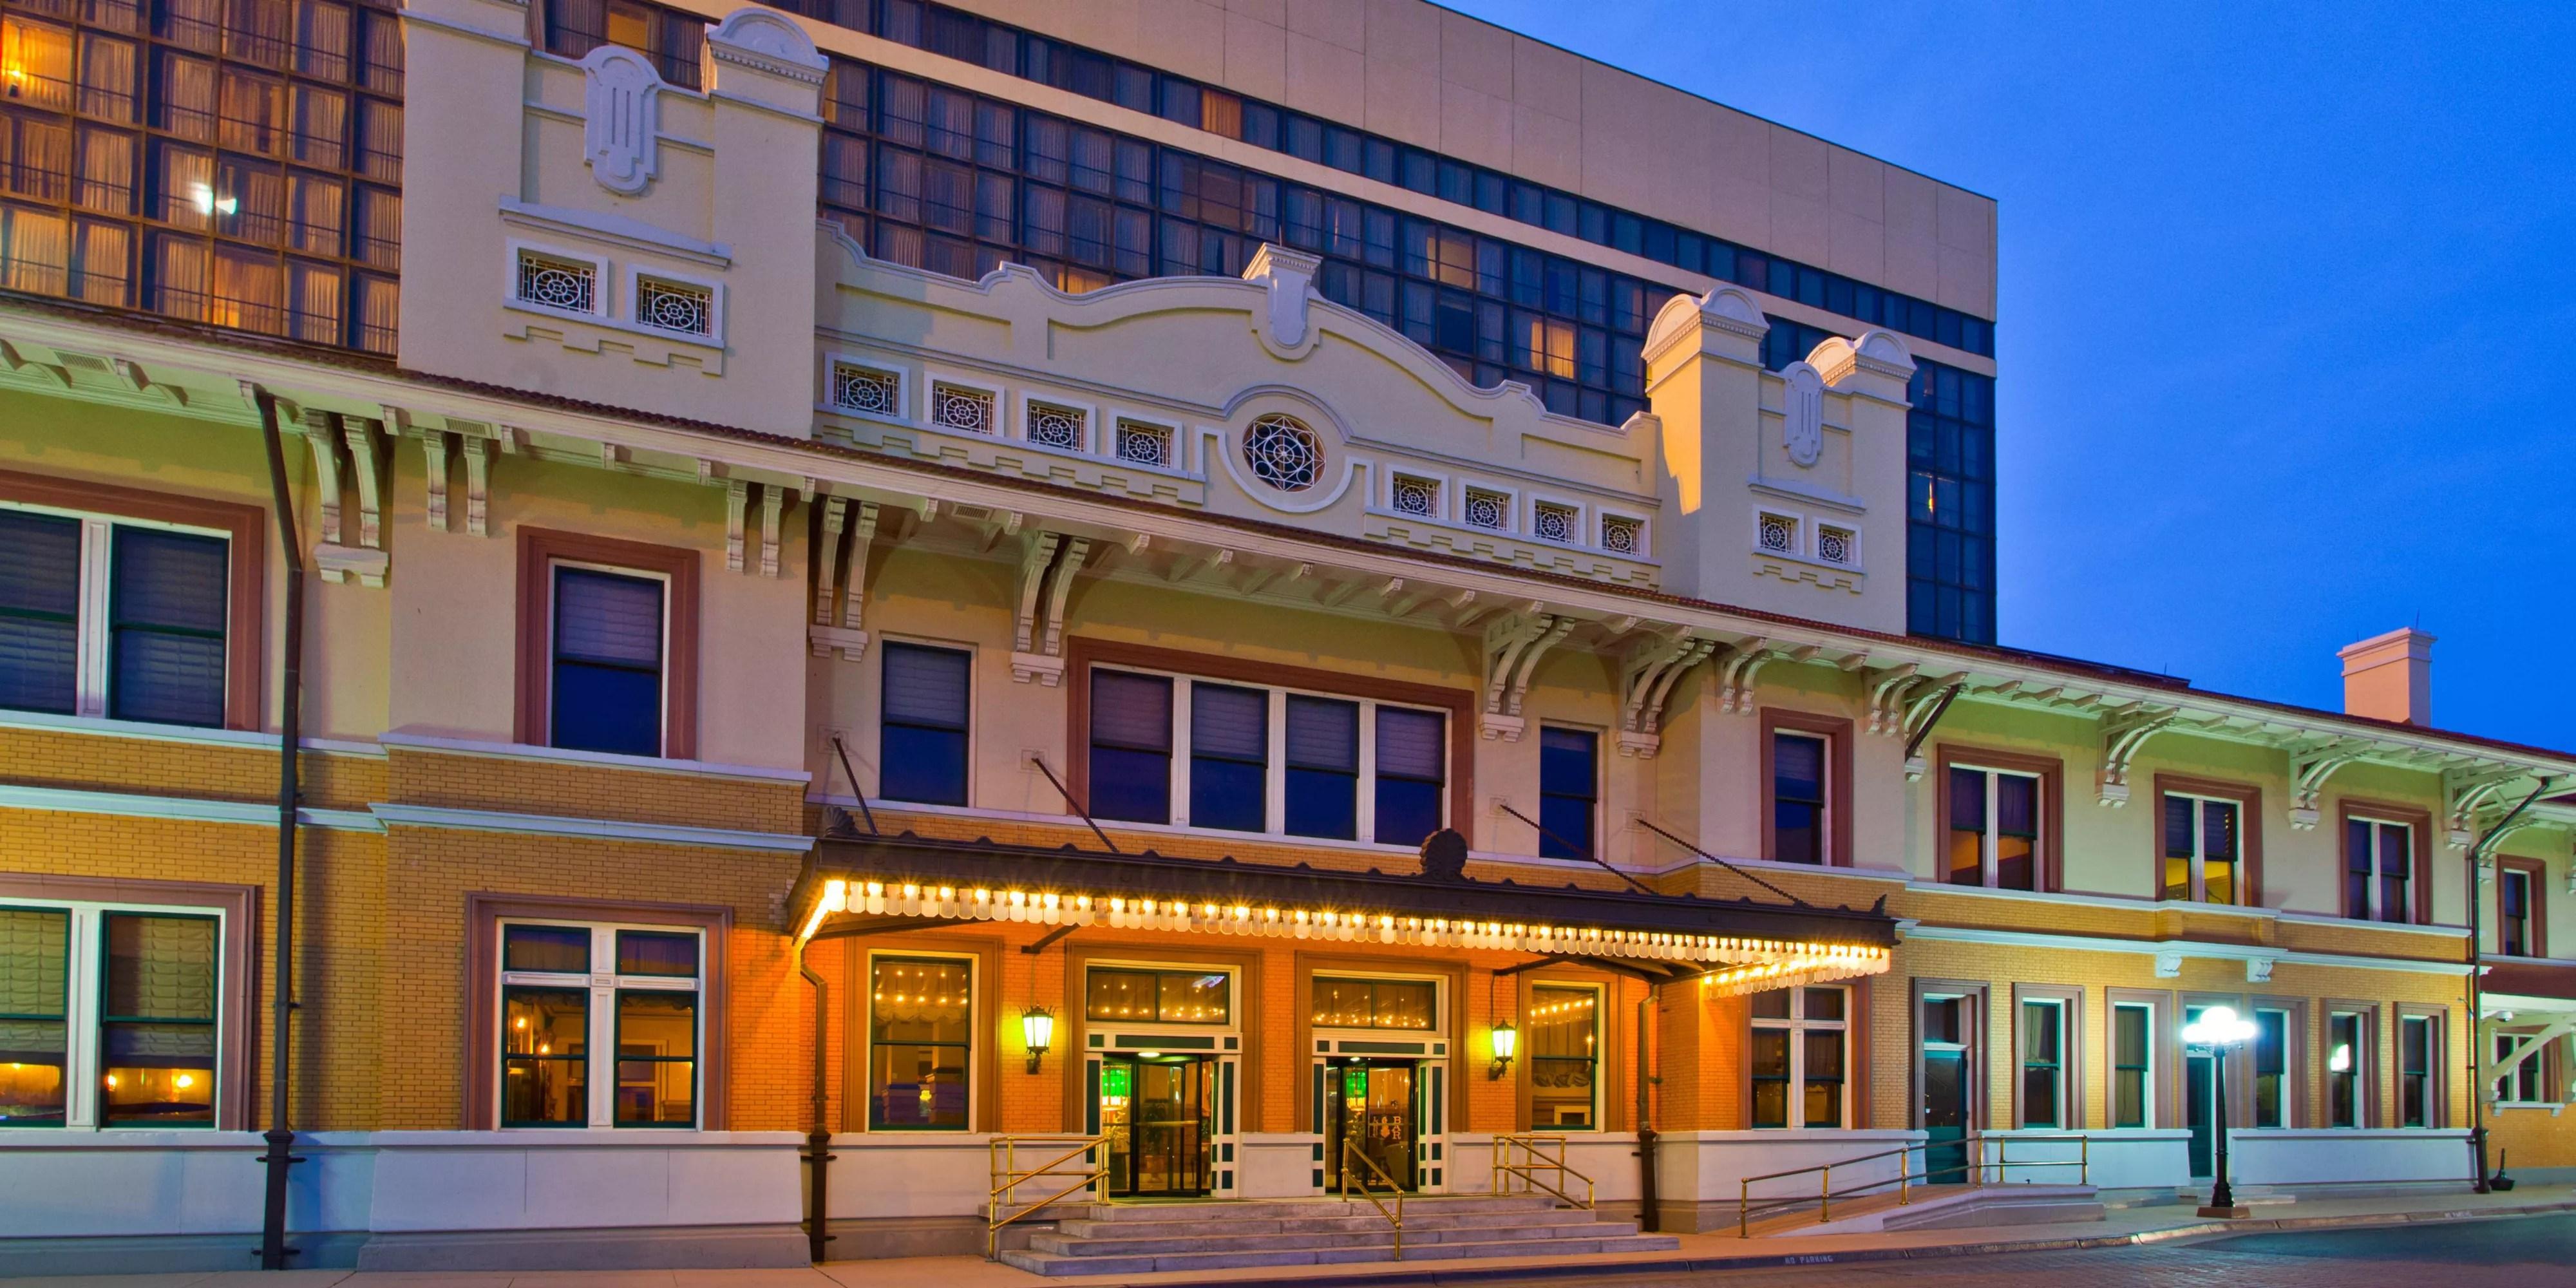 Crowne Plaza Pensacola Grand Hotel